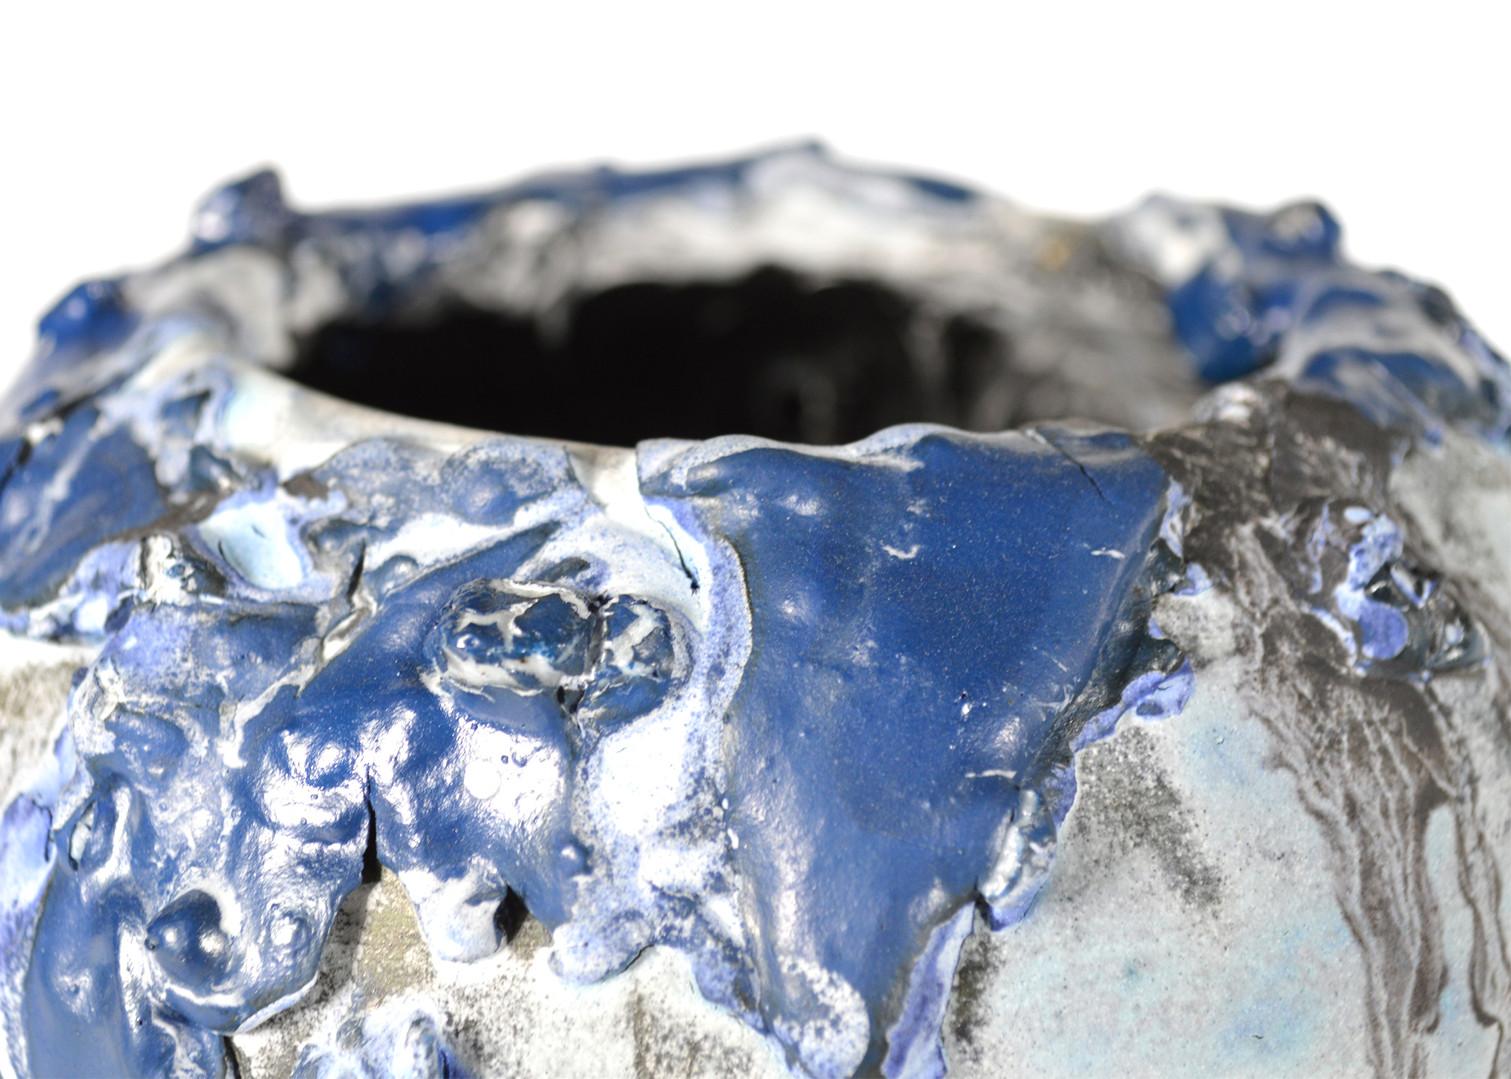 Pam-Space-Dog-Moon-Jar-Blue-White-Side1.